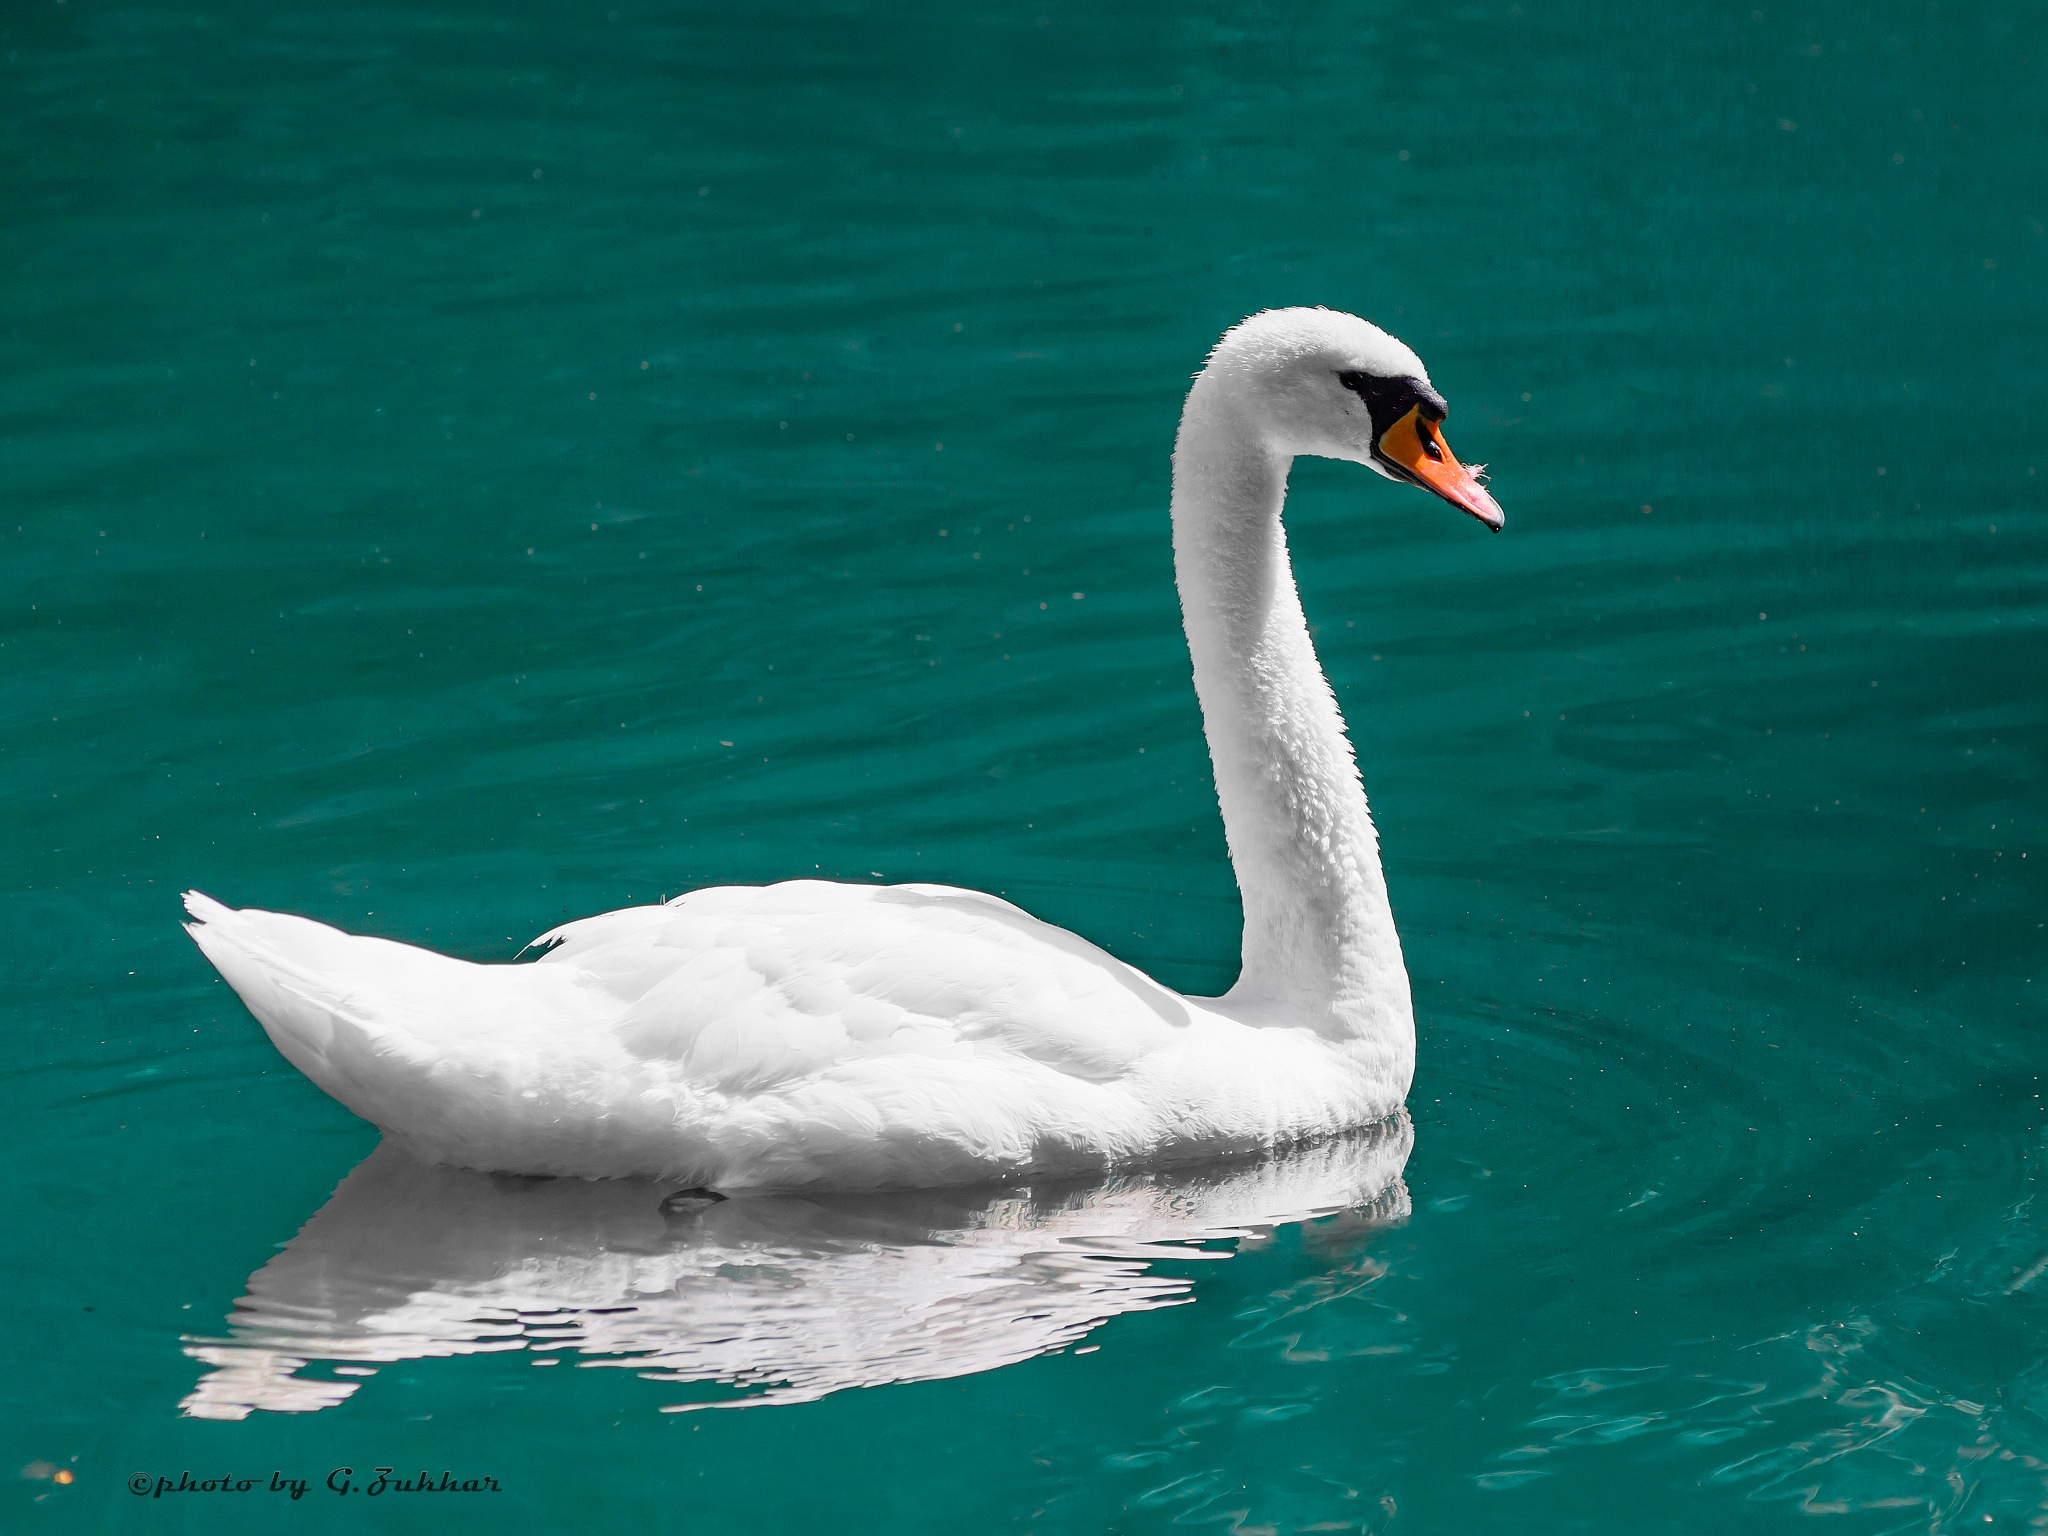 White Swan by Georgii Zukhar